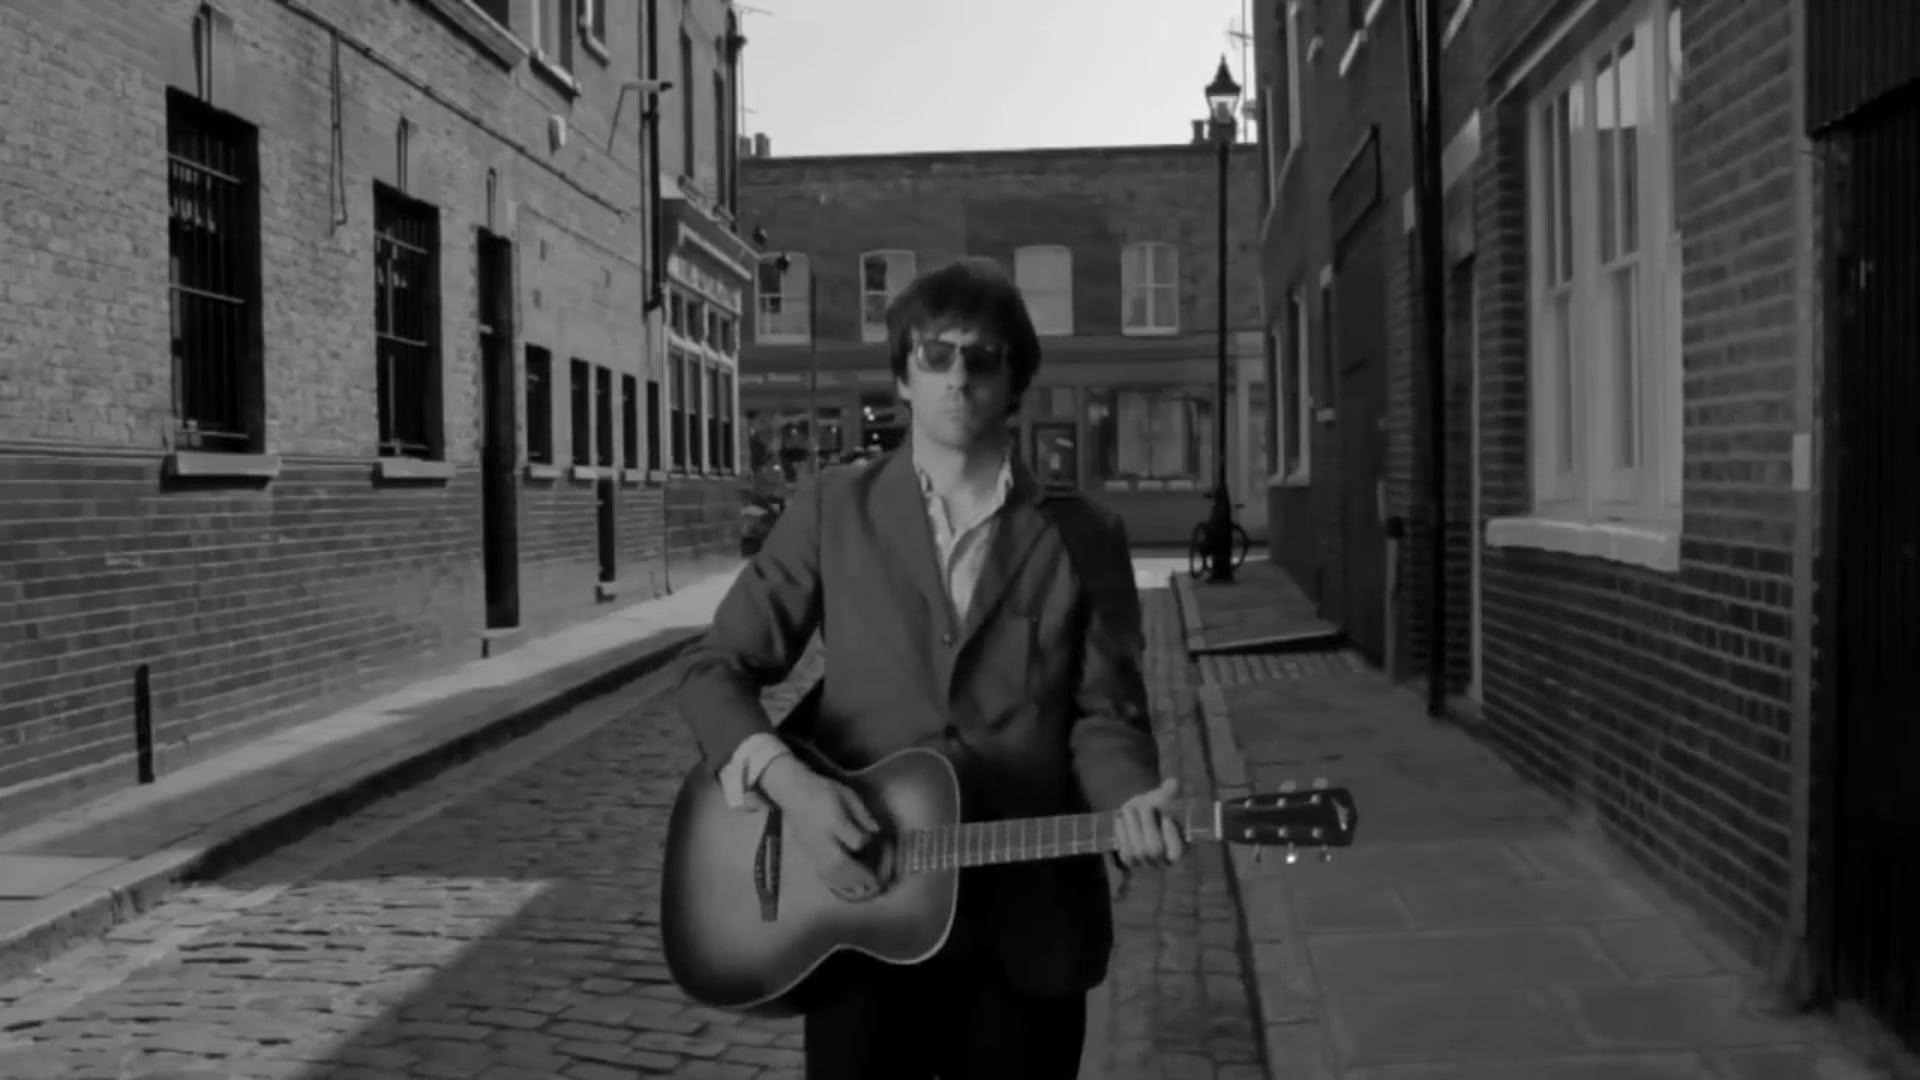 Graham Coxon - Ooh, Yeh Yeh